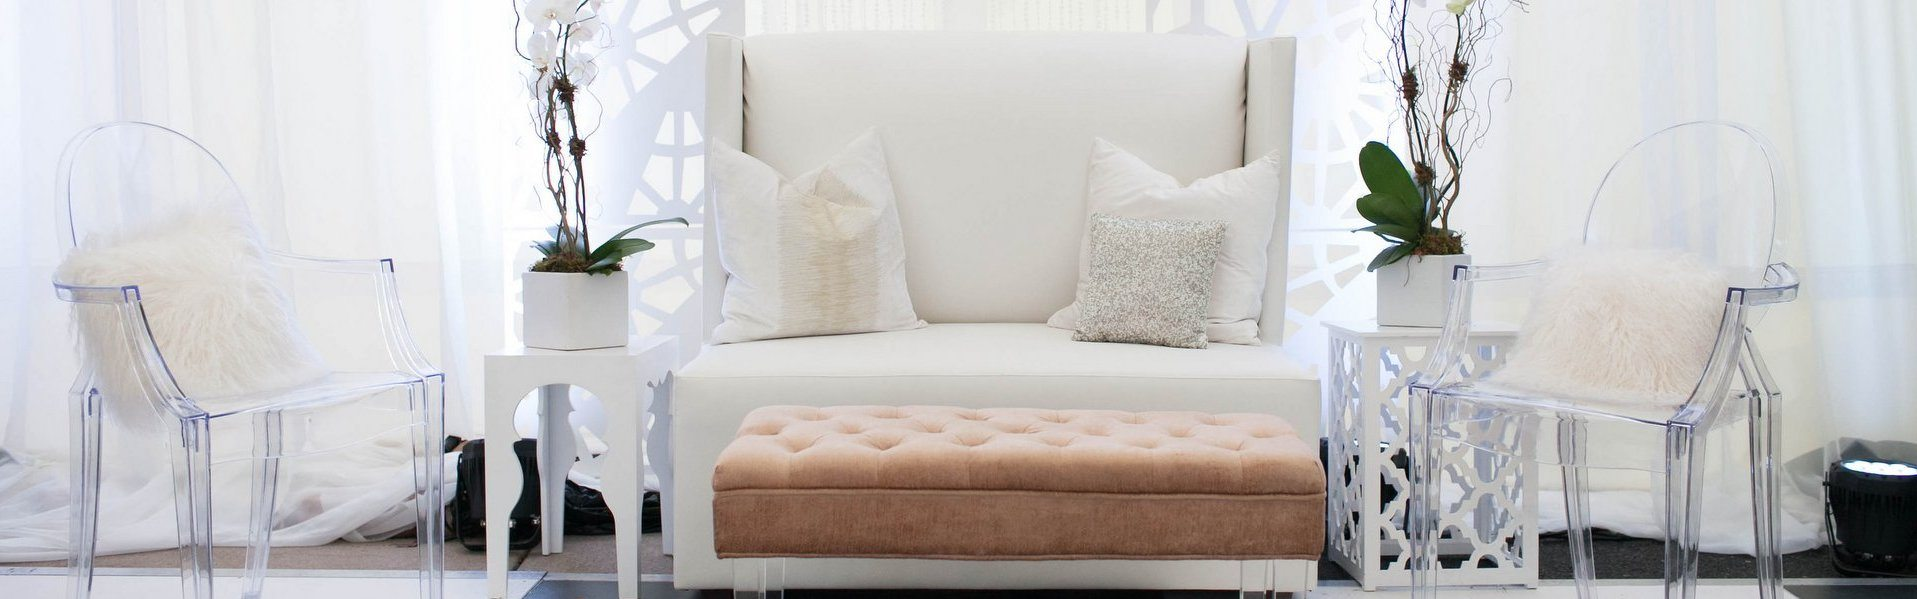 Furniture Rental Nashville Tn Furniture Nashville Furniture For Added Comfort Decor Furniture